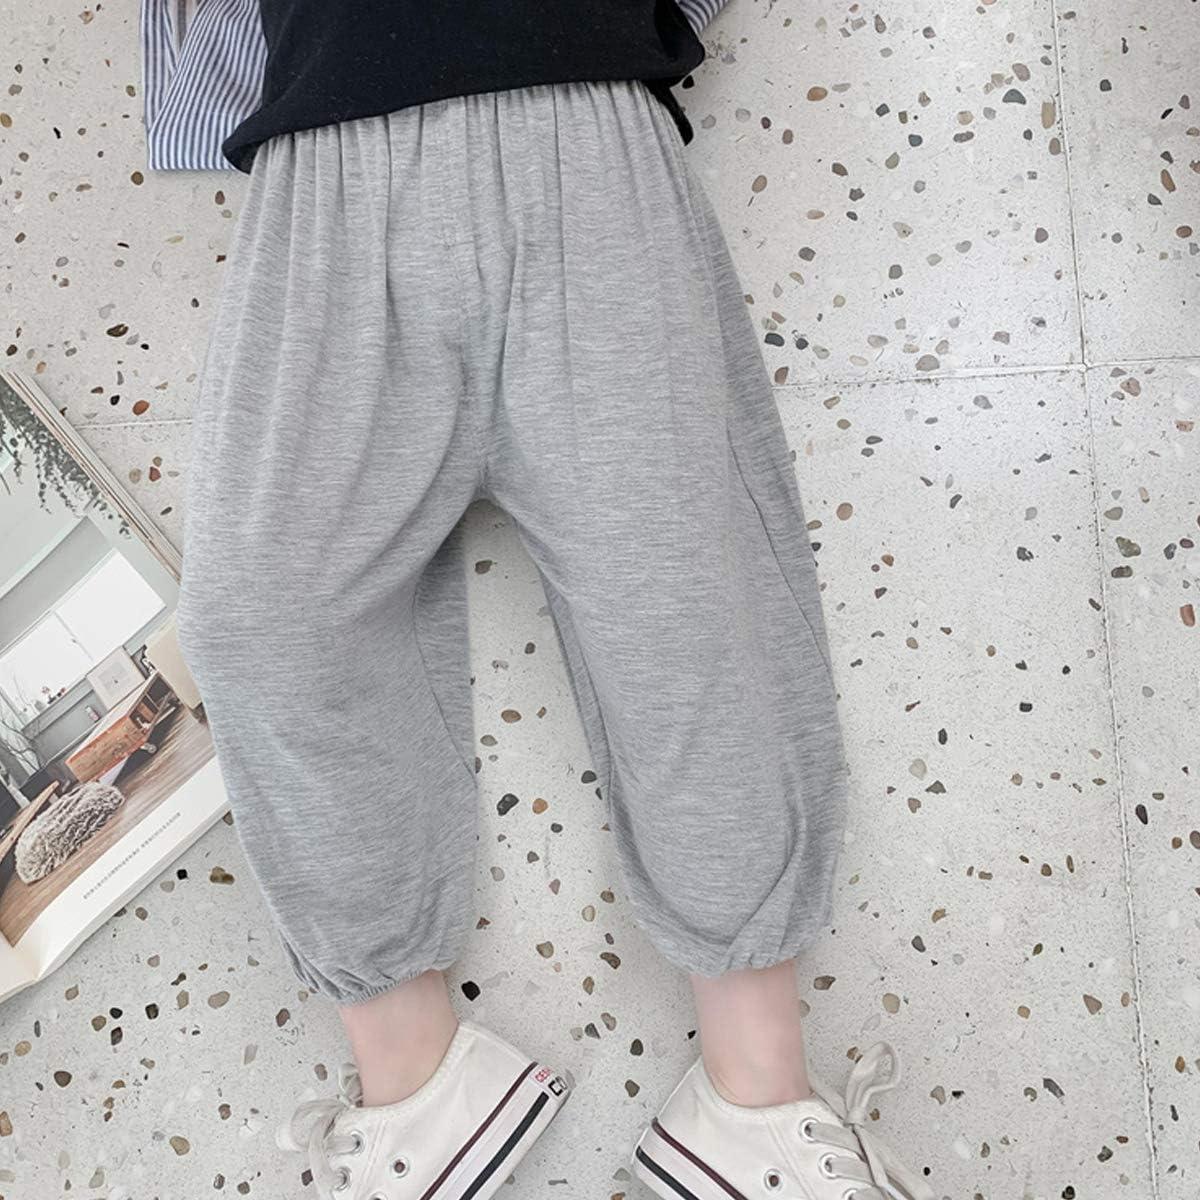 OnlyAngel Kids Boys Harem Pants Solid Elastic Waist Drop-Crotch Dance Active Pants Age 3-8 Years